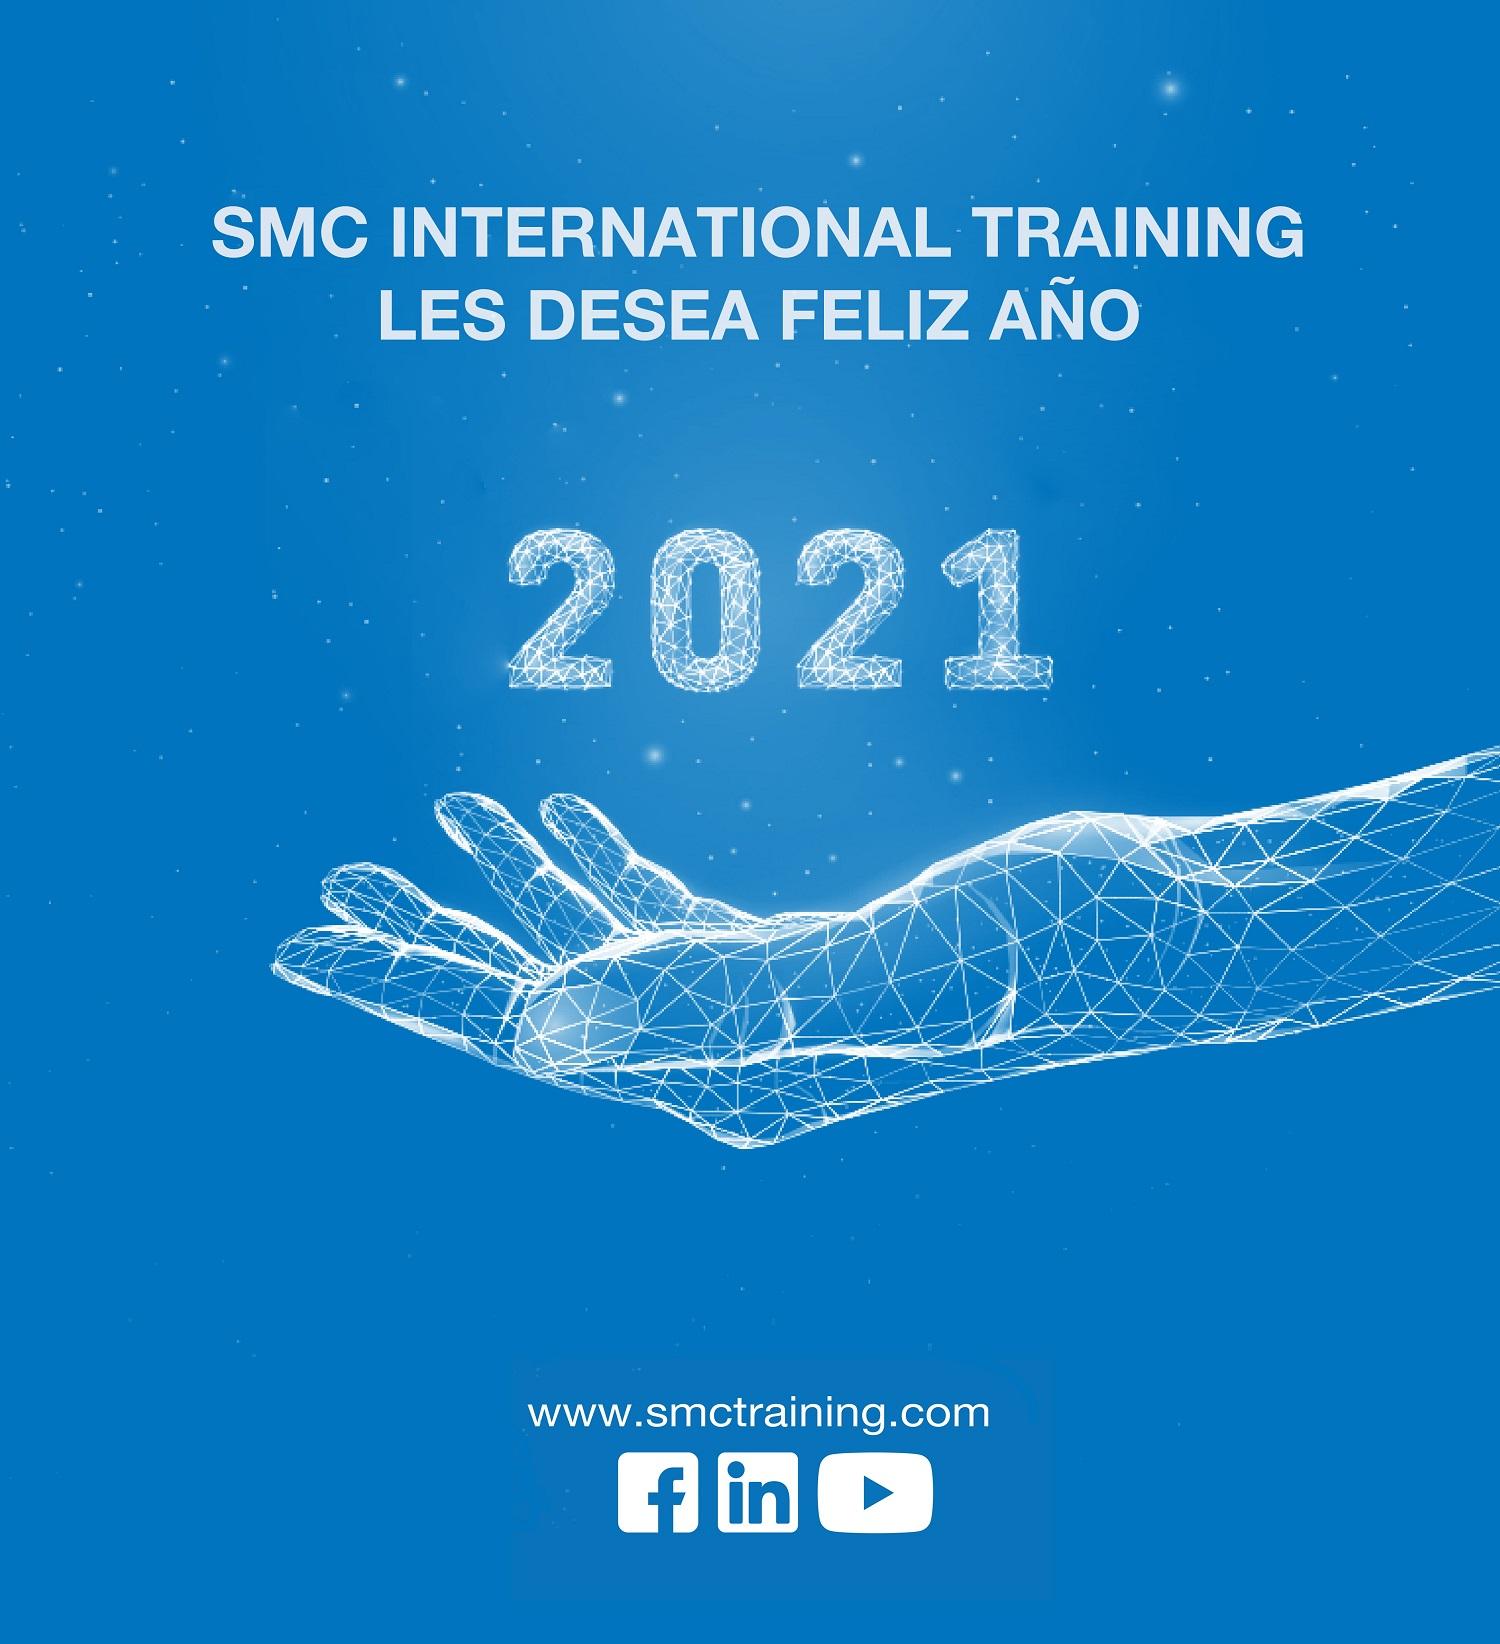 SMC International Training les desea feliz año 2021